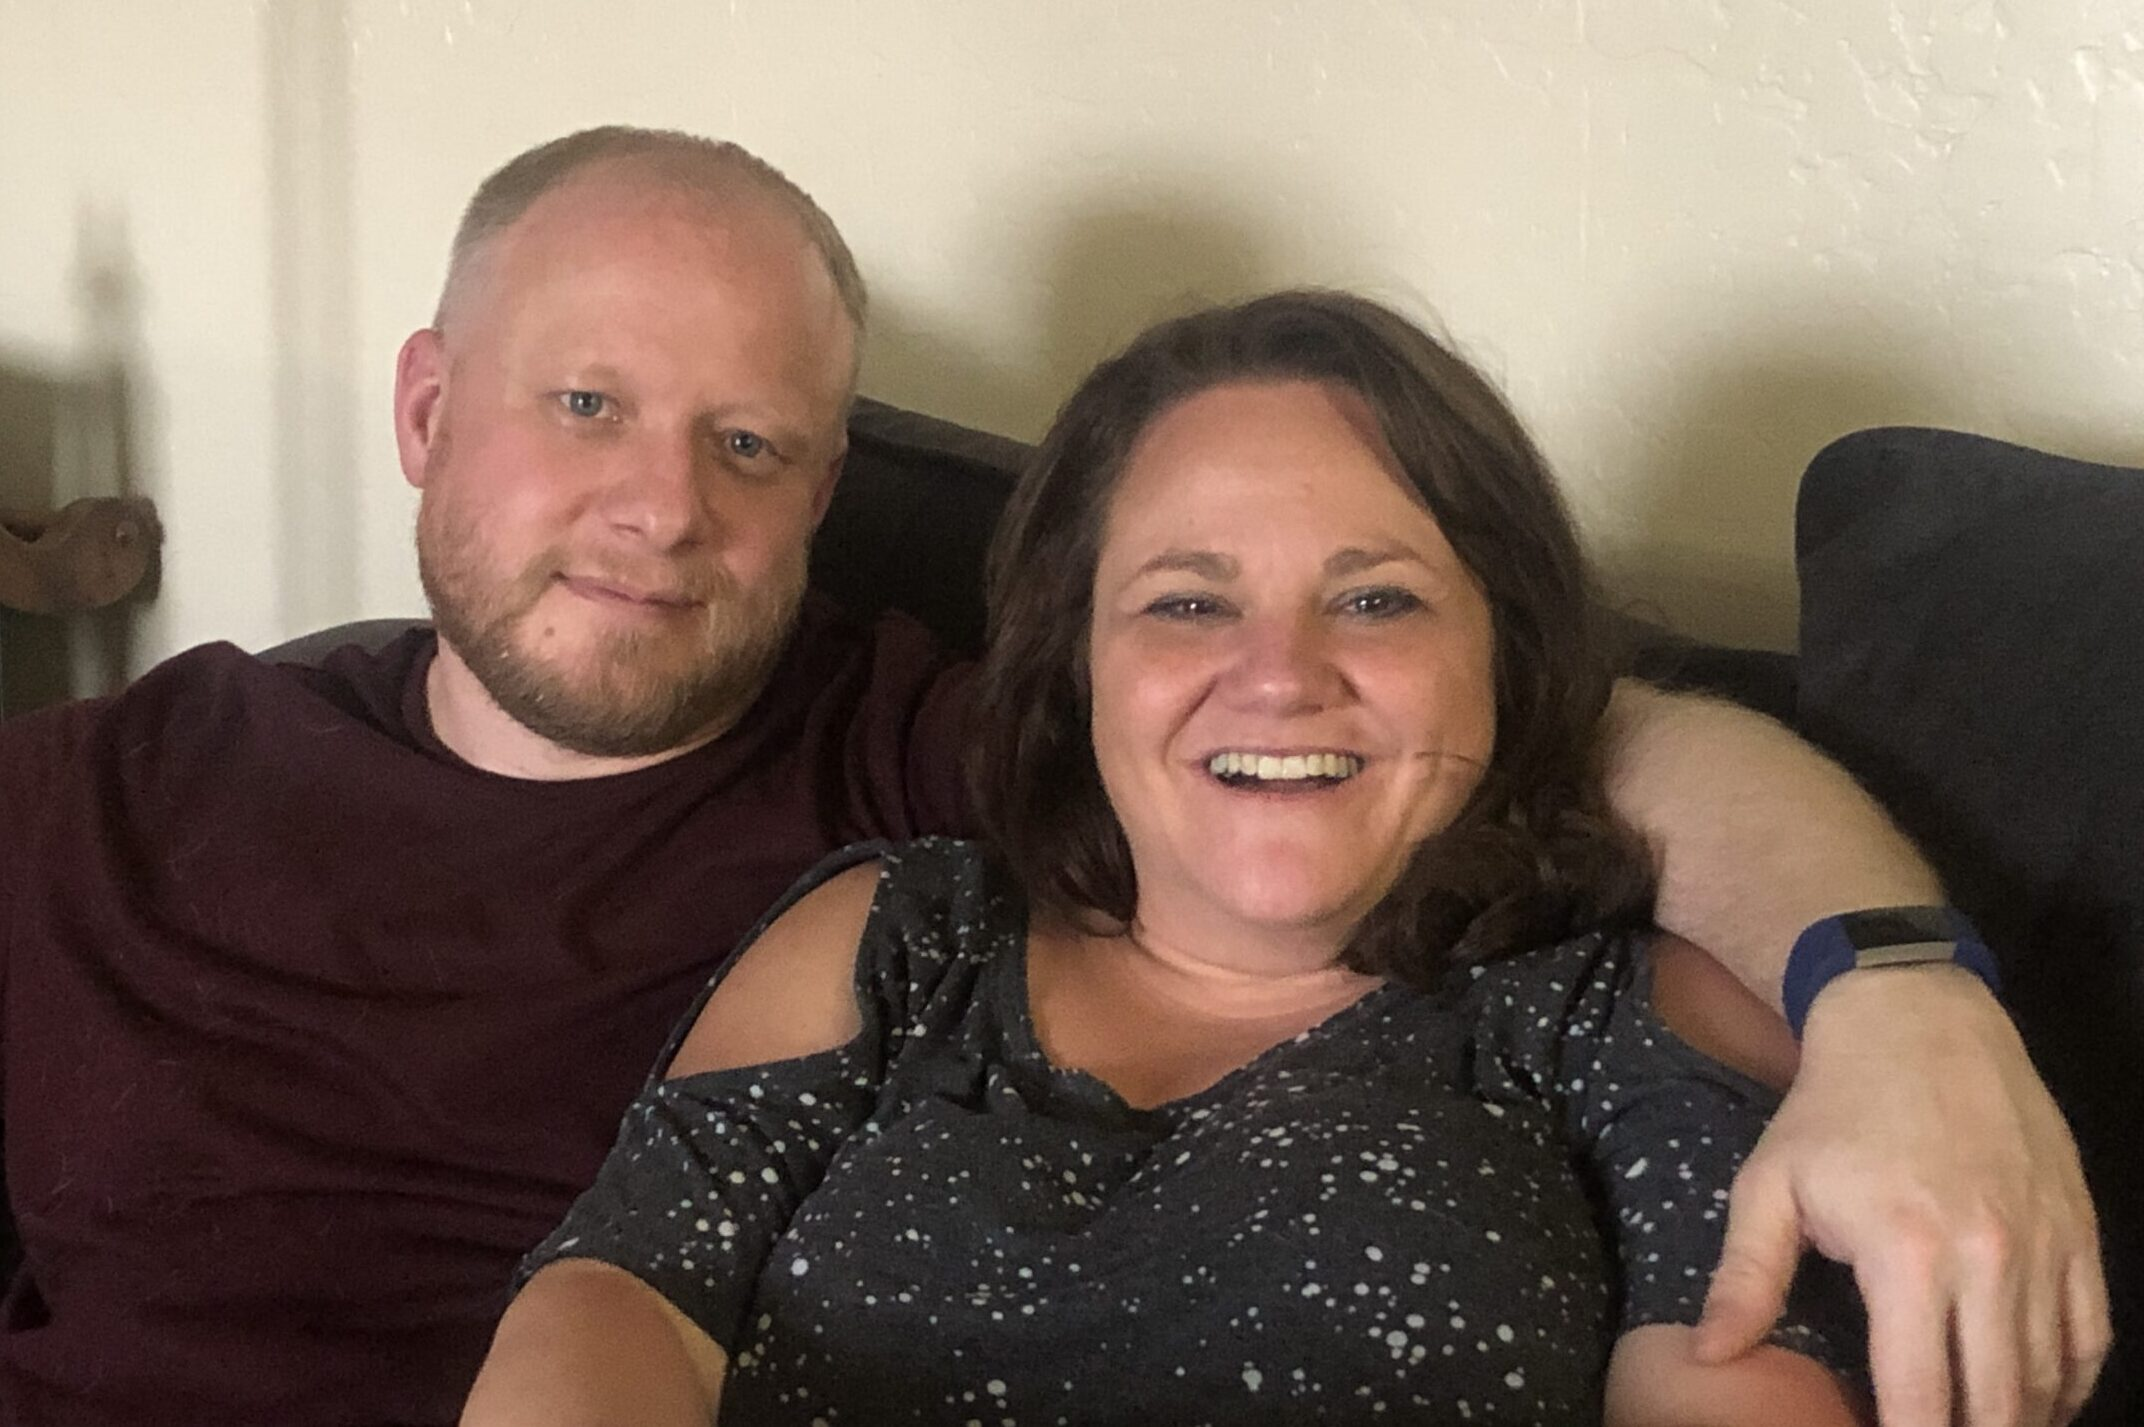 Matt and Hilary Glasgow at their home in Pueblo.